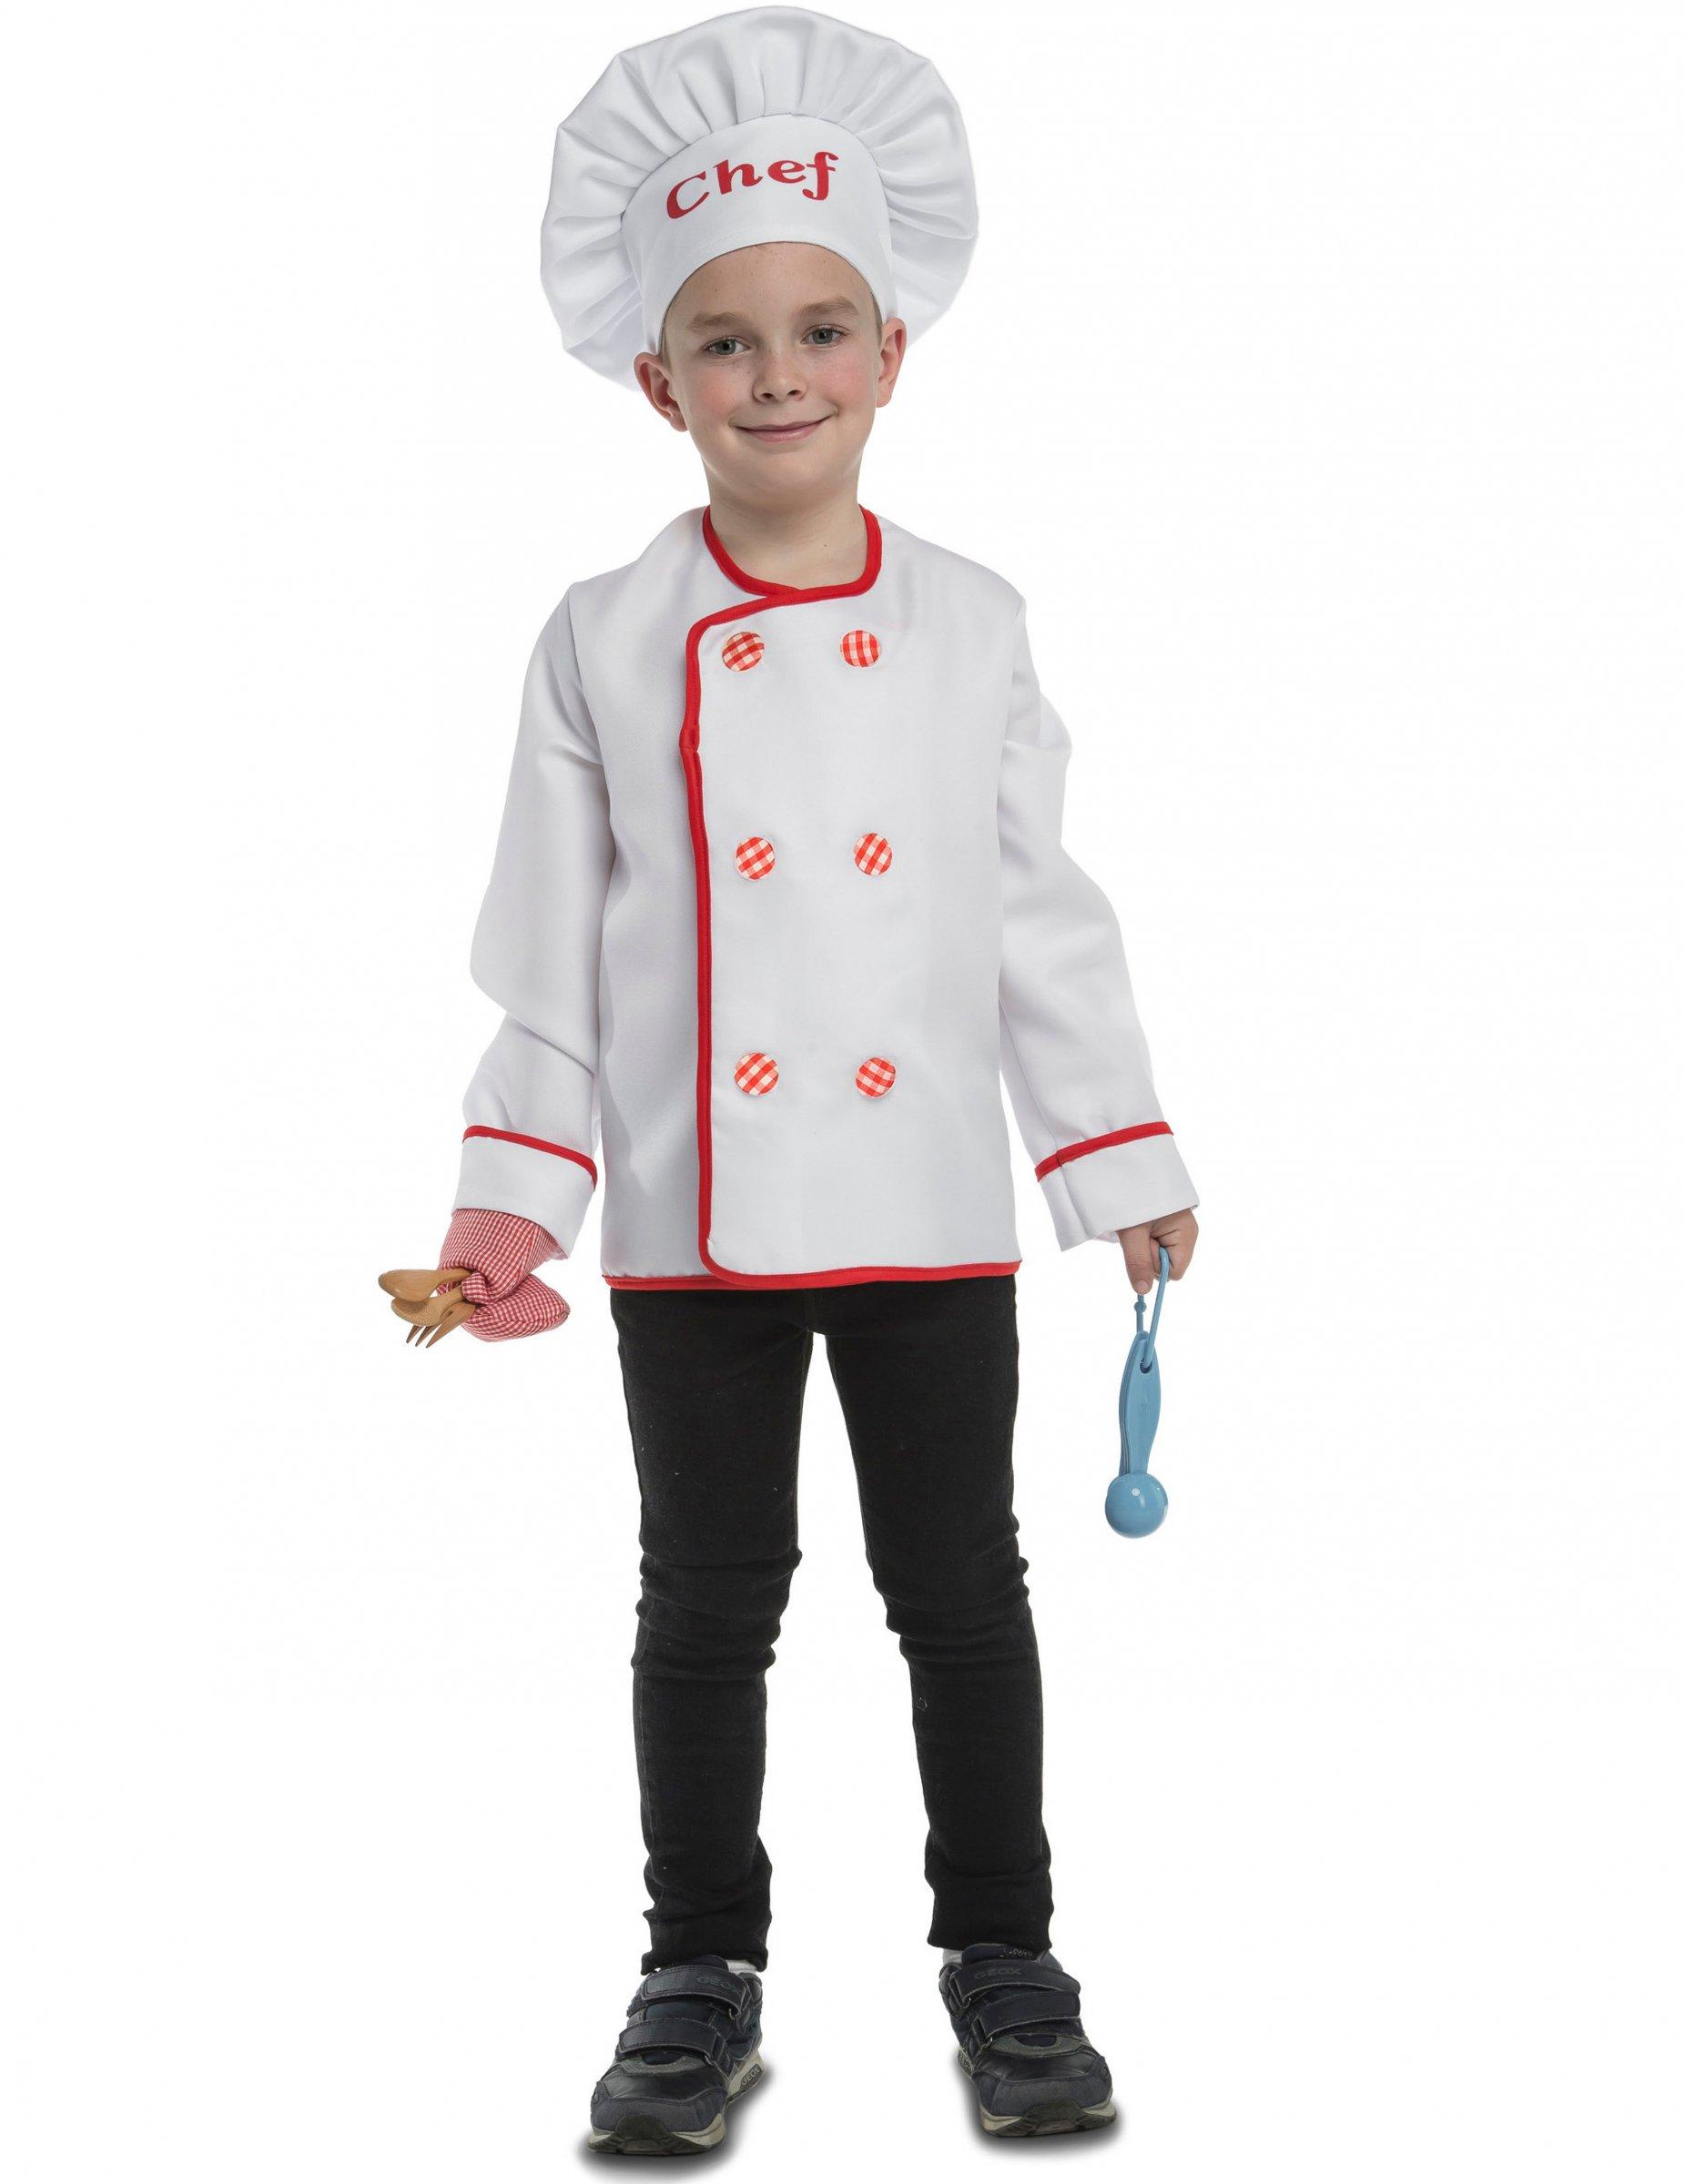 Disfraz chef de cocina con accesorios para ni o disfraces for Accesorios para chef